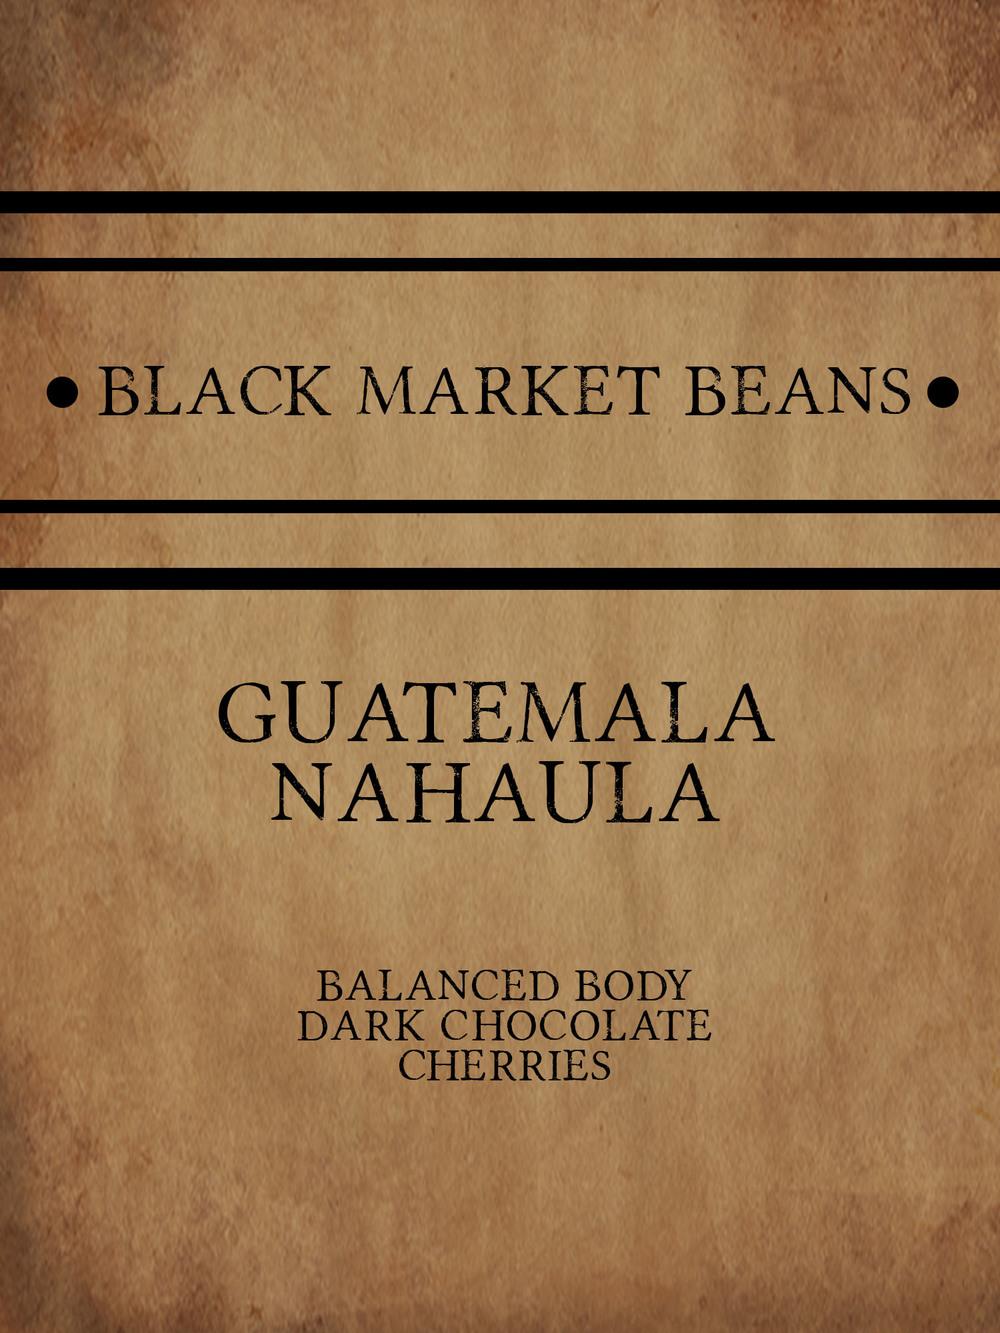 coffee_Guatemala_Nahaula.jpg